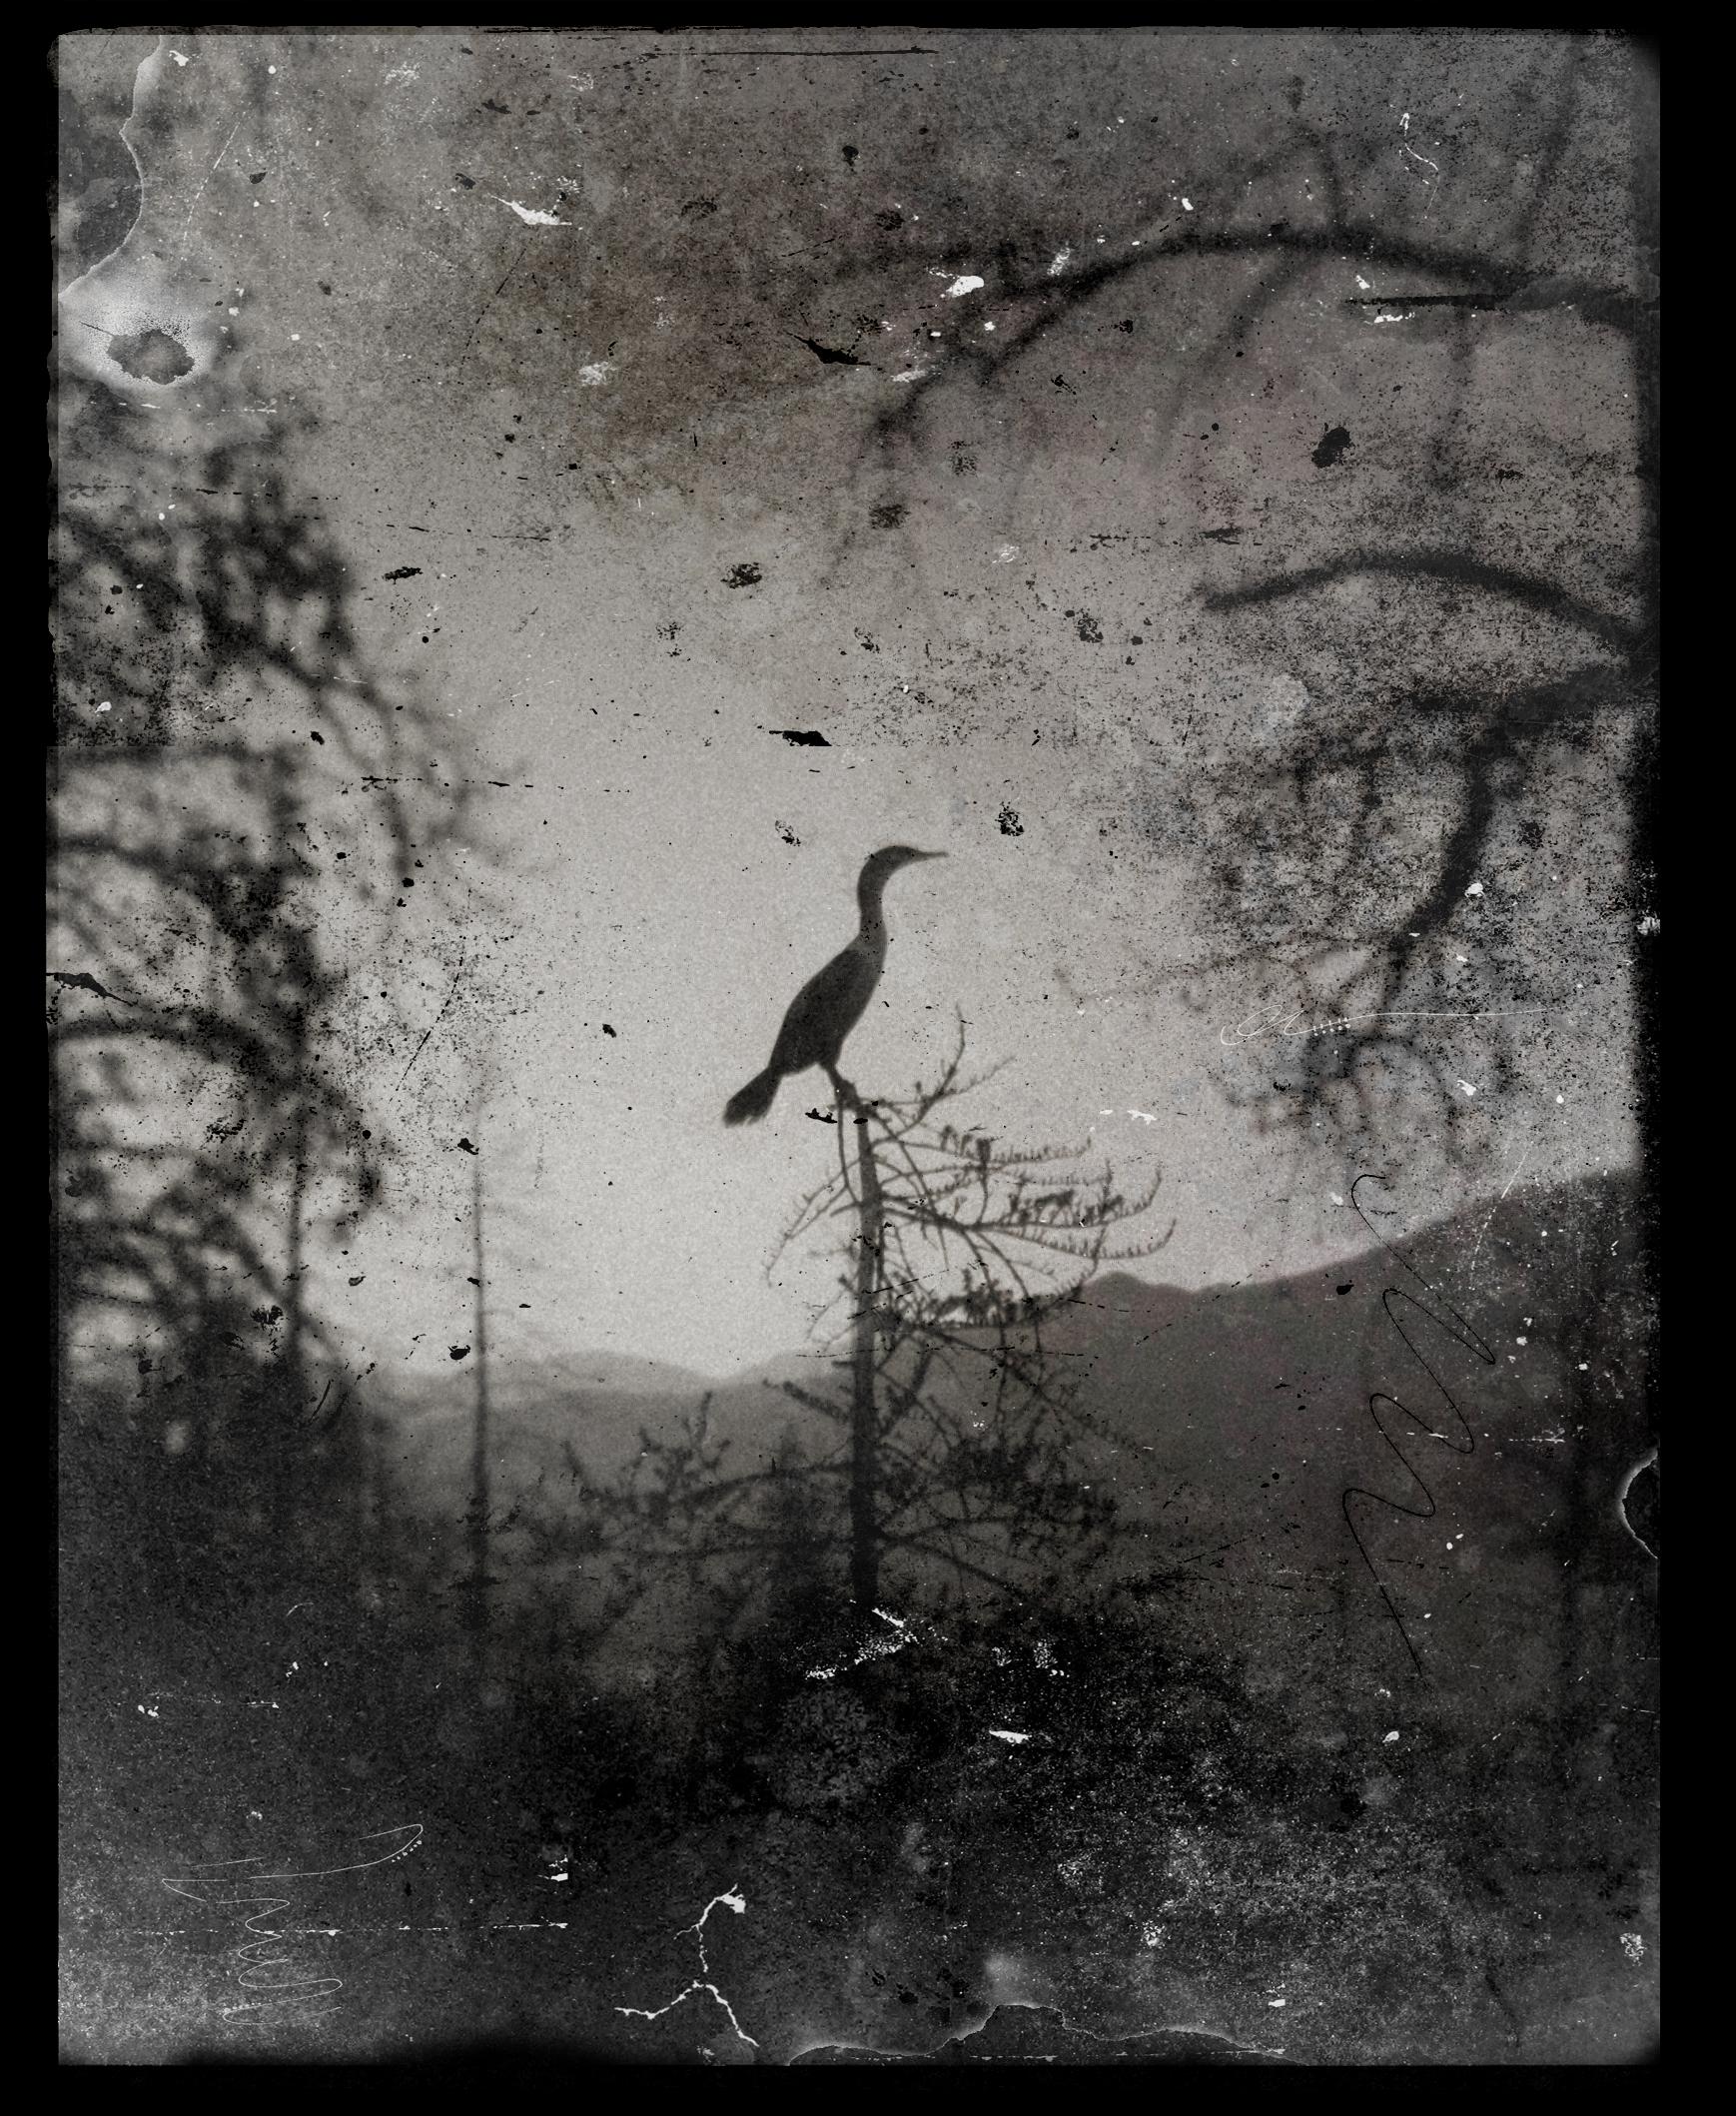 Cormorant by ditchcock